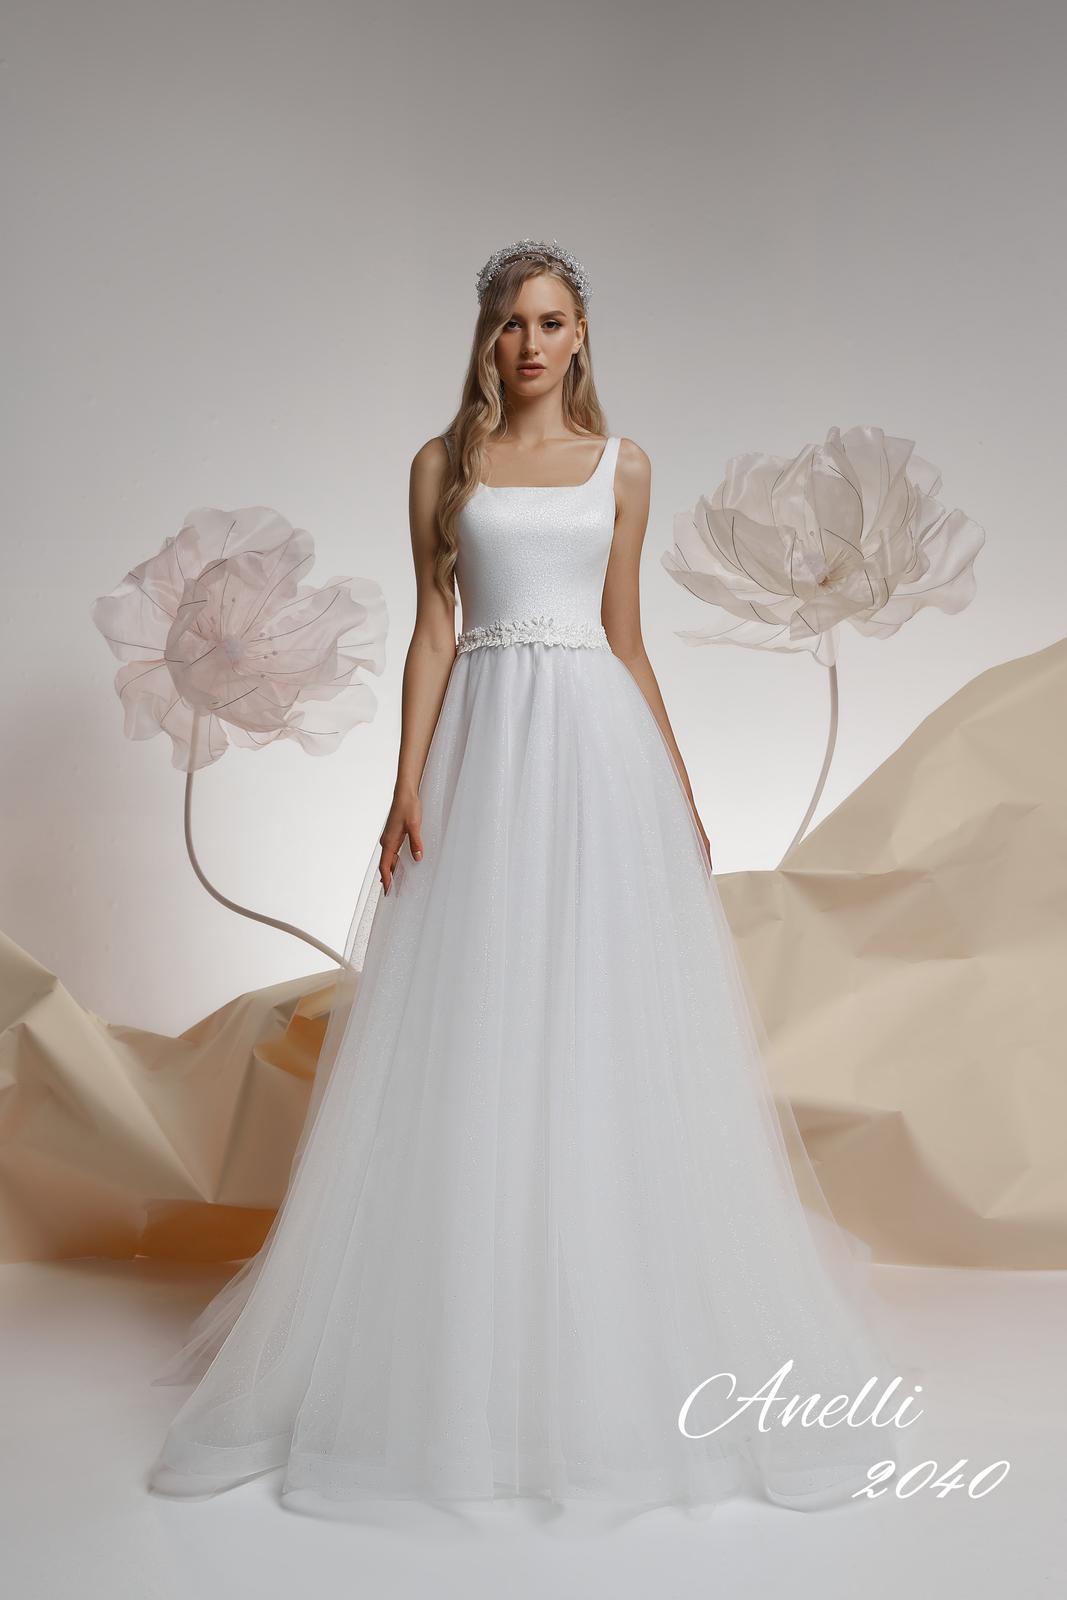 Svadobné šaty - Imagine 2040 - Obrázok č. 1